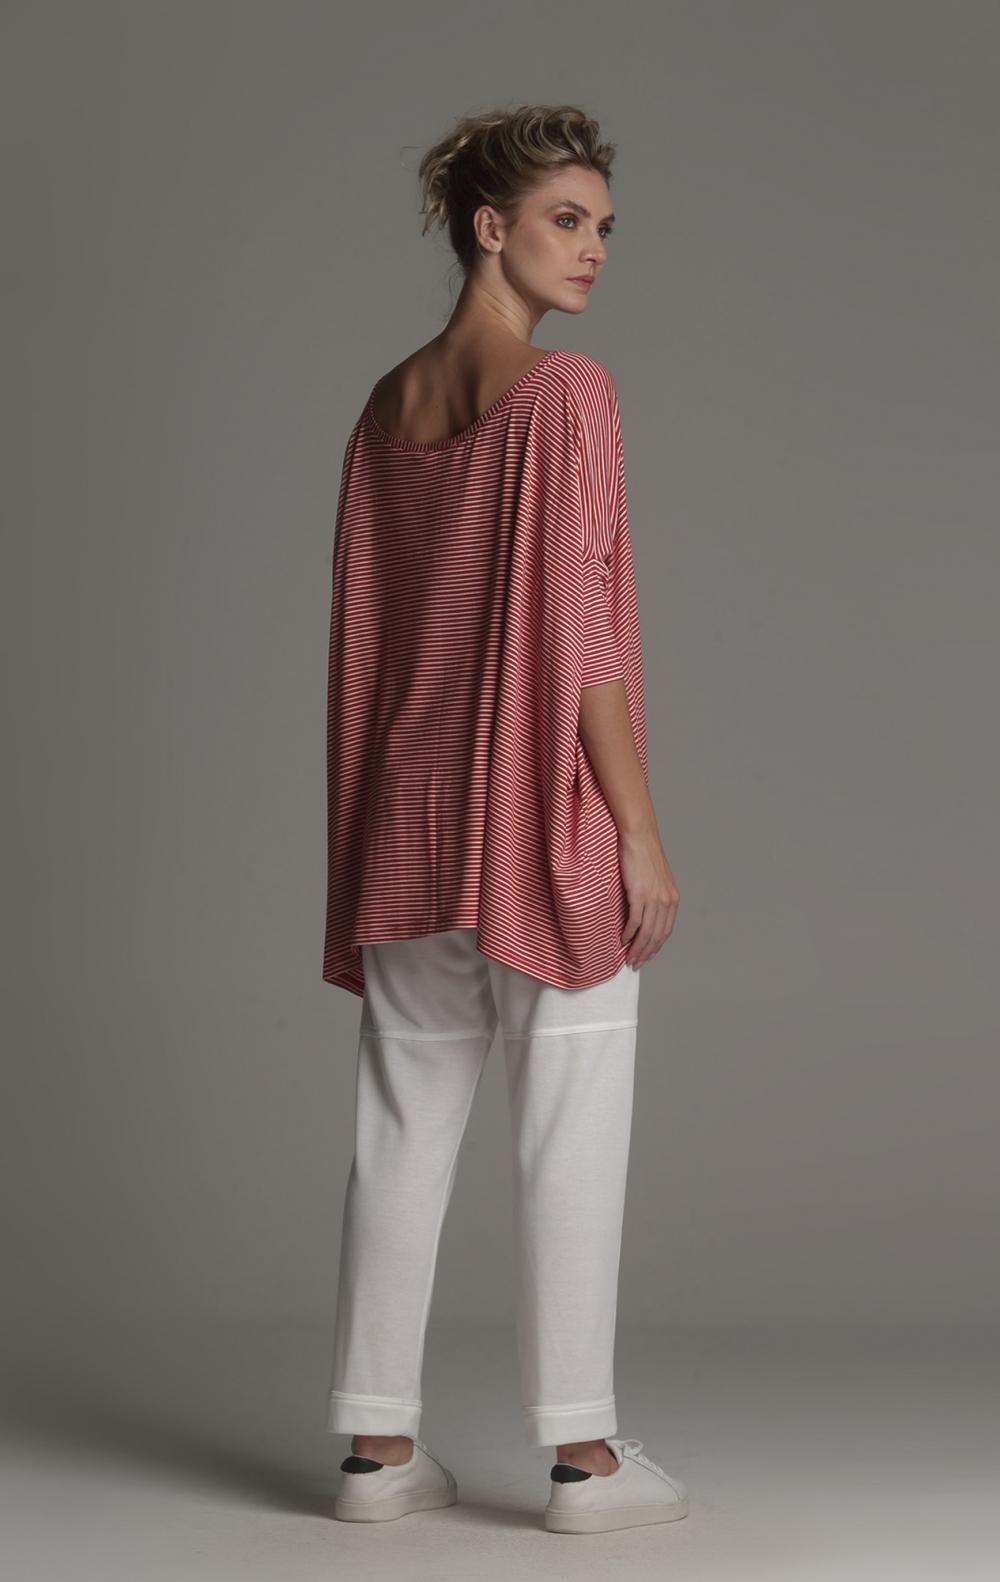 Blusa Ampla Malha Listrada - Foto 3